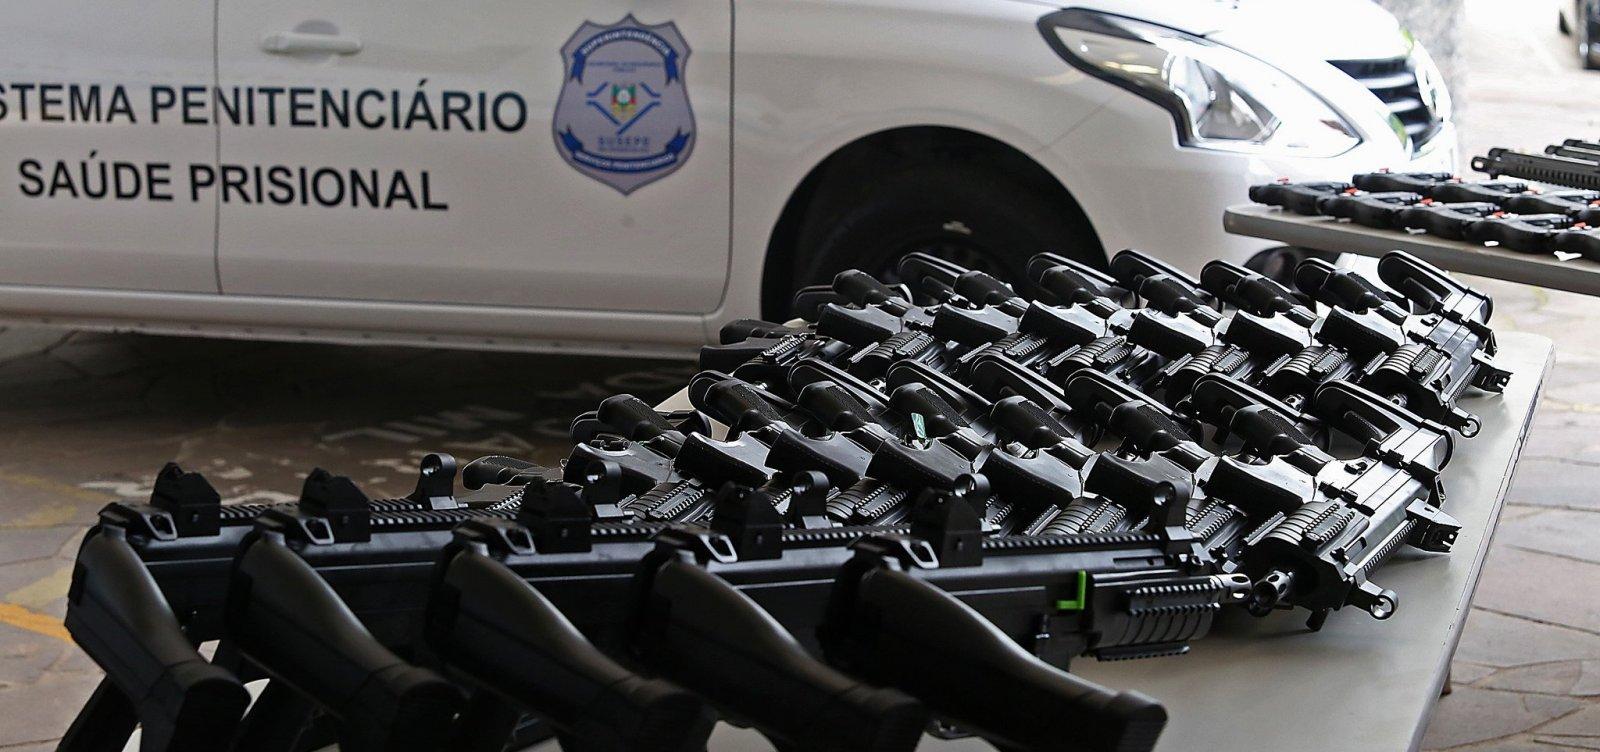 [Novos fabricantes de armas se preparam para entrar no mercado brasileiro]